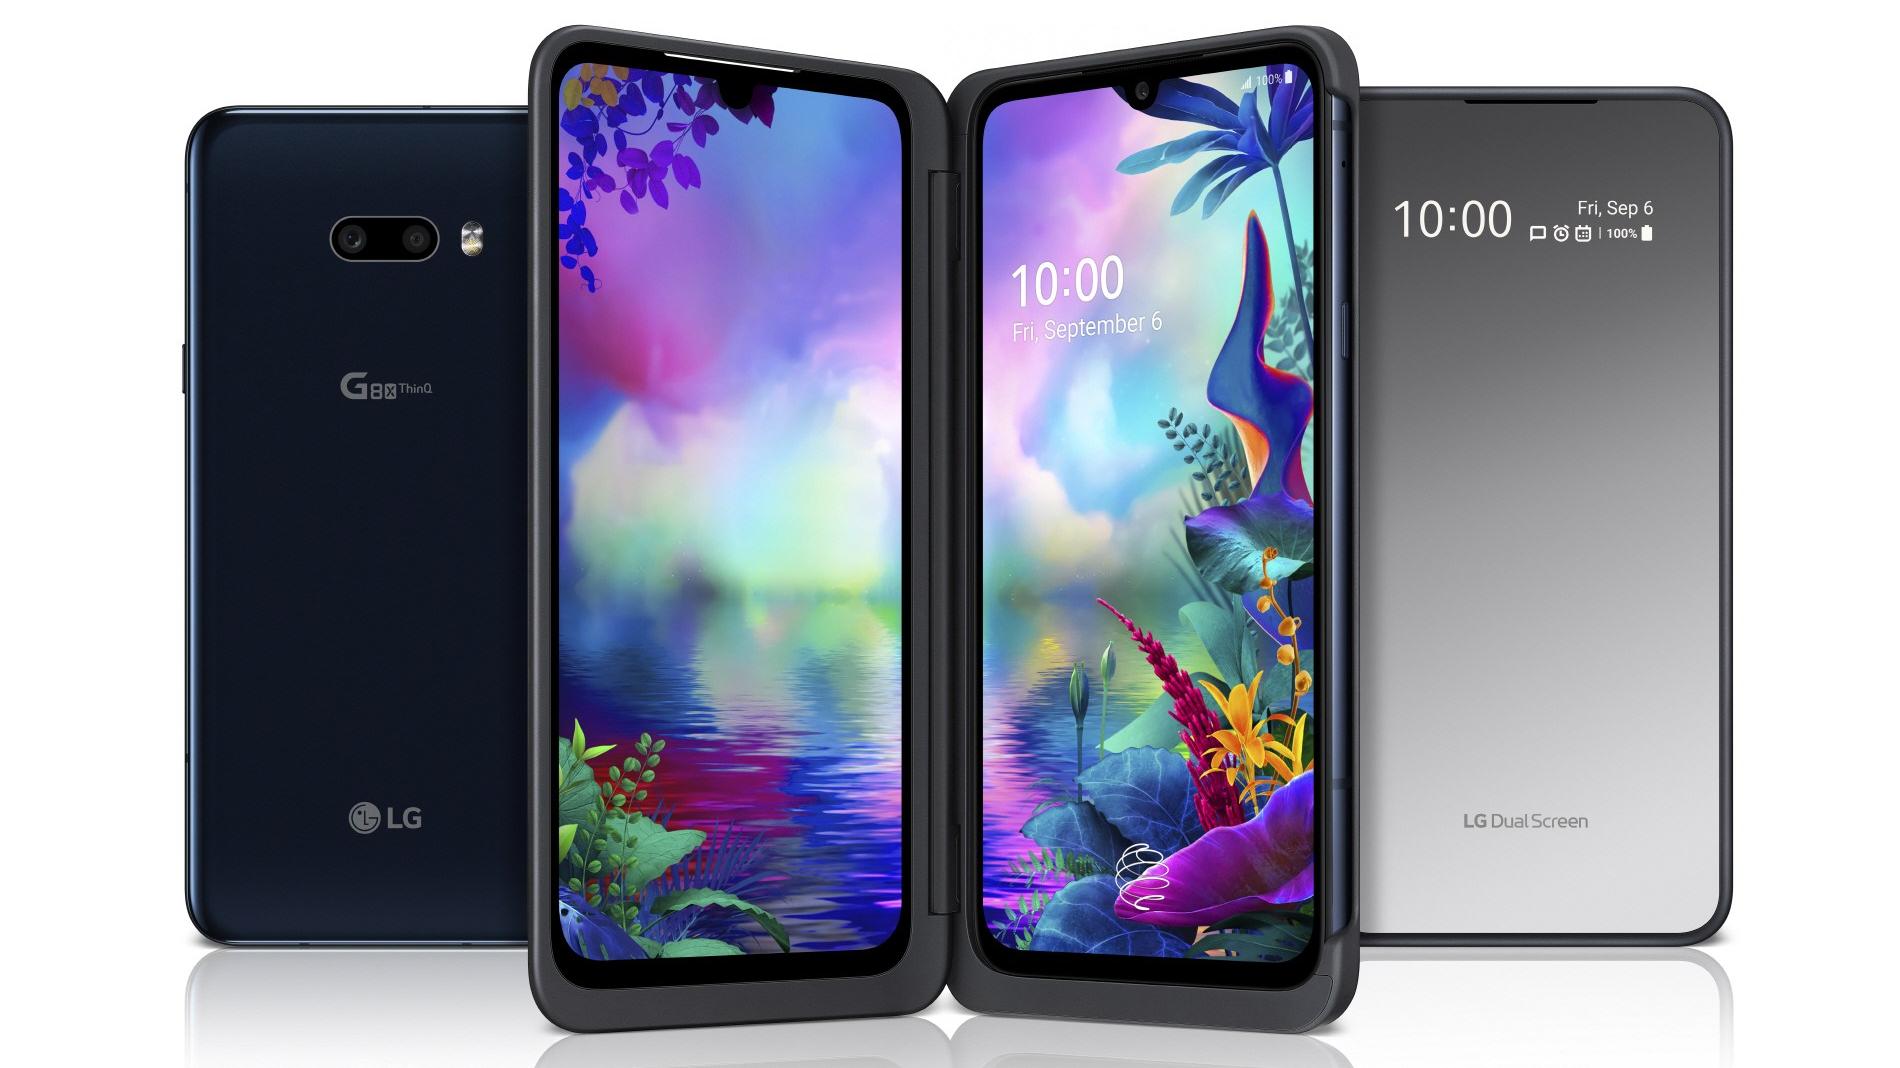 LG G8X ThinQ and LG Dua Screen